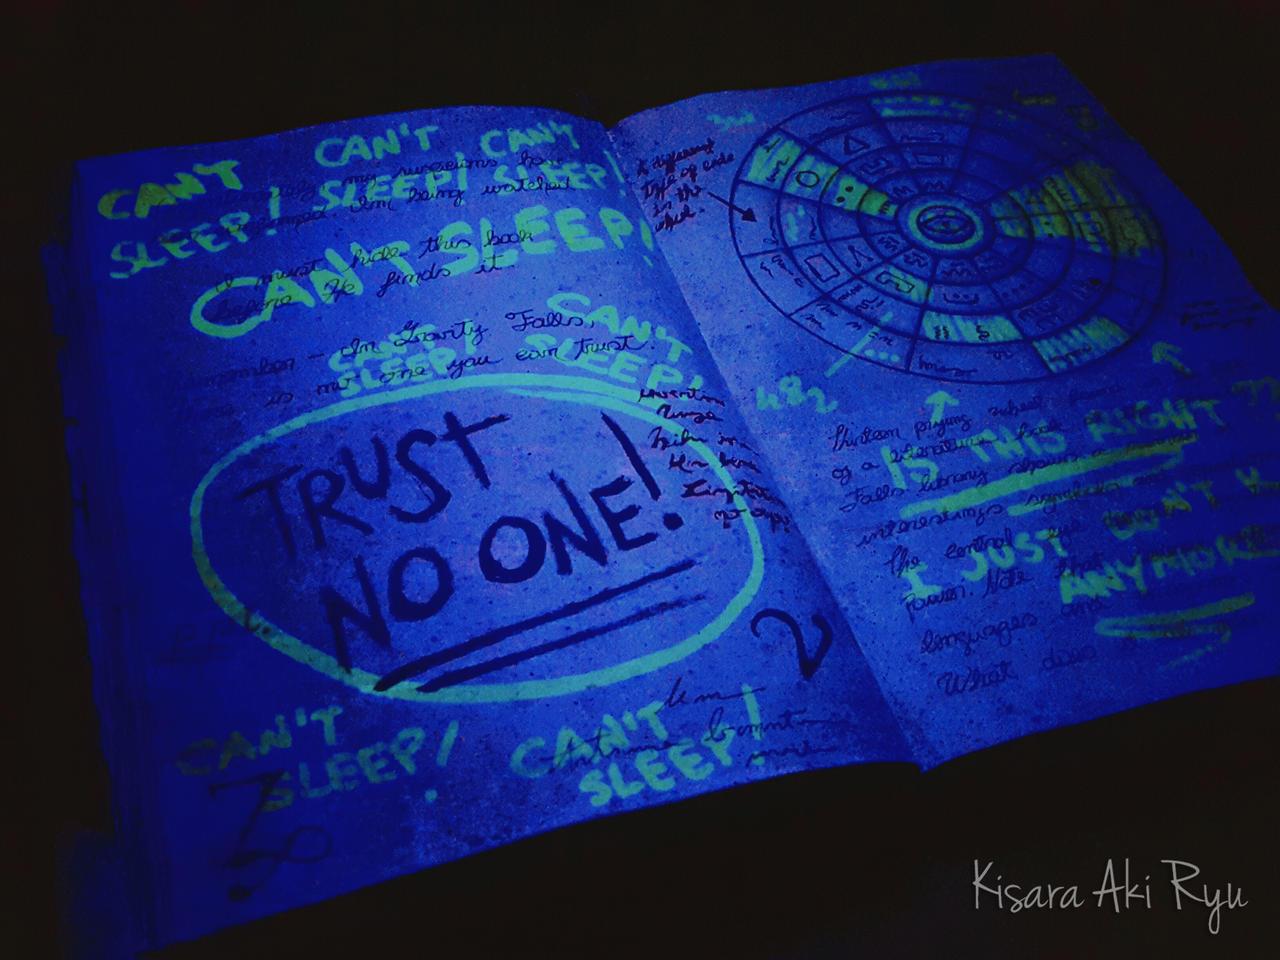 Can't Sleep! 2 (Uv Light) Journal 3 Gravity Falls By